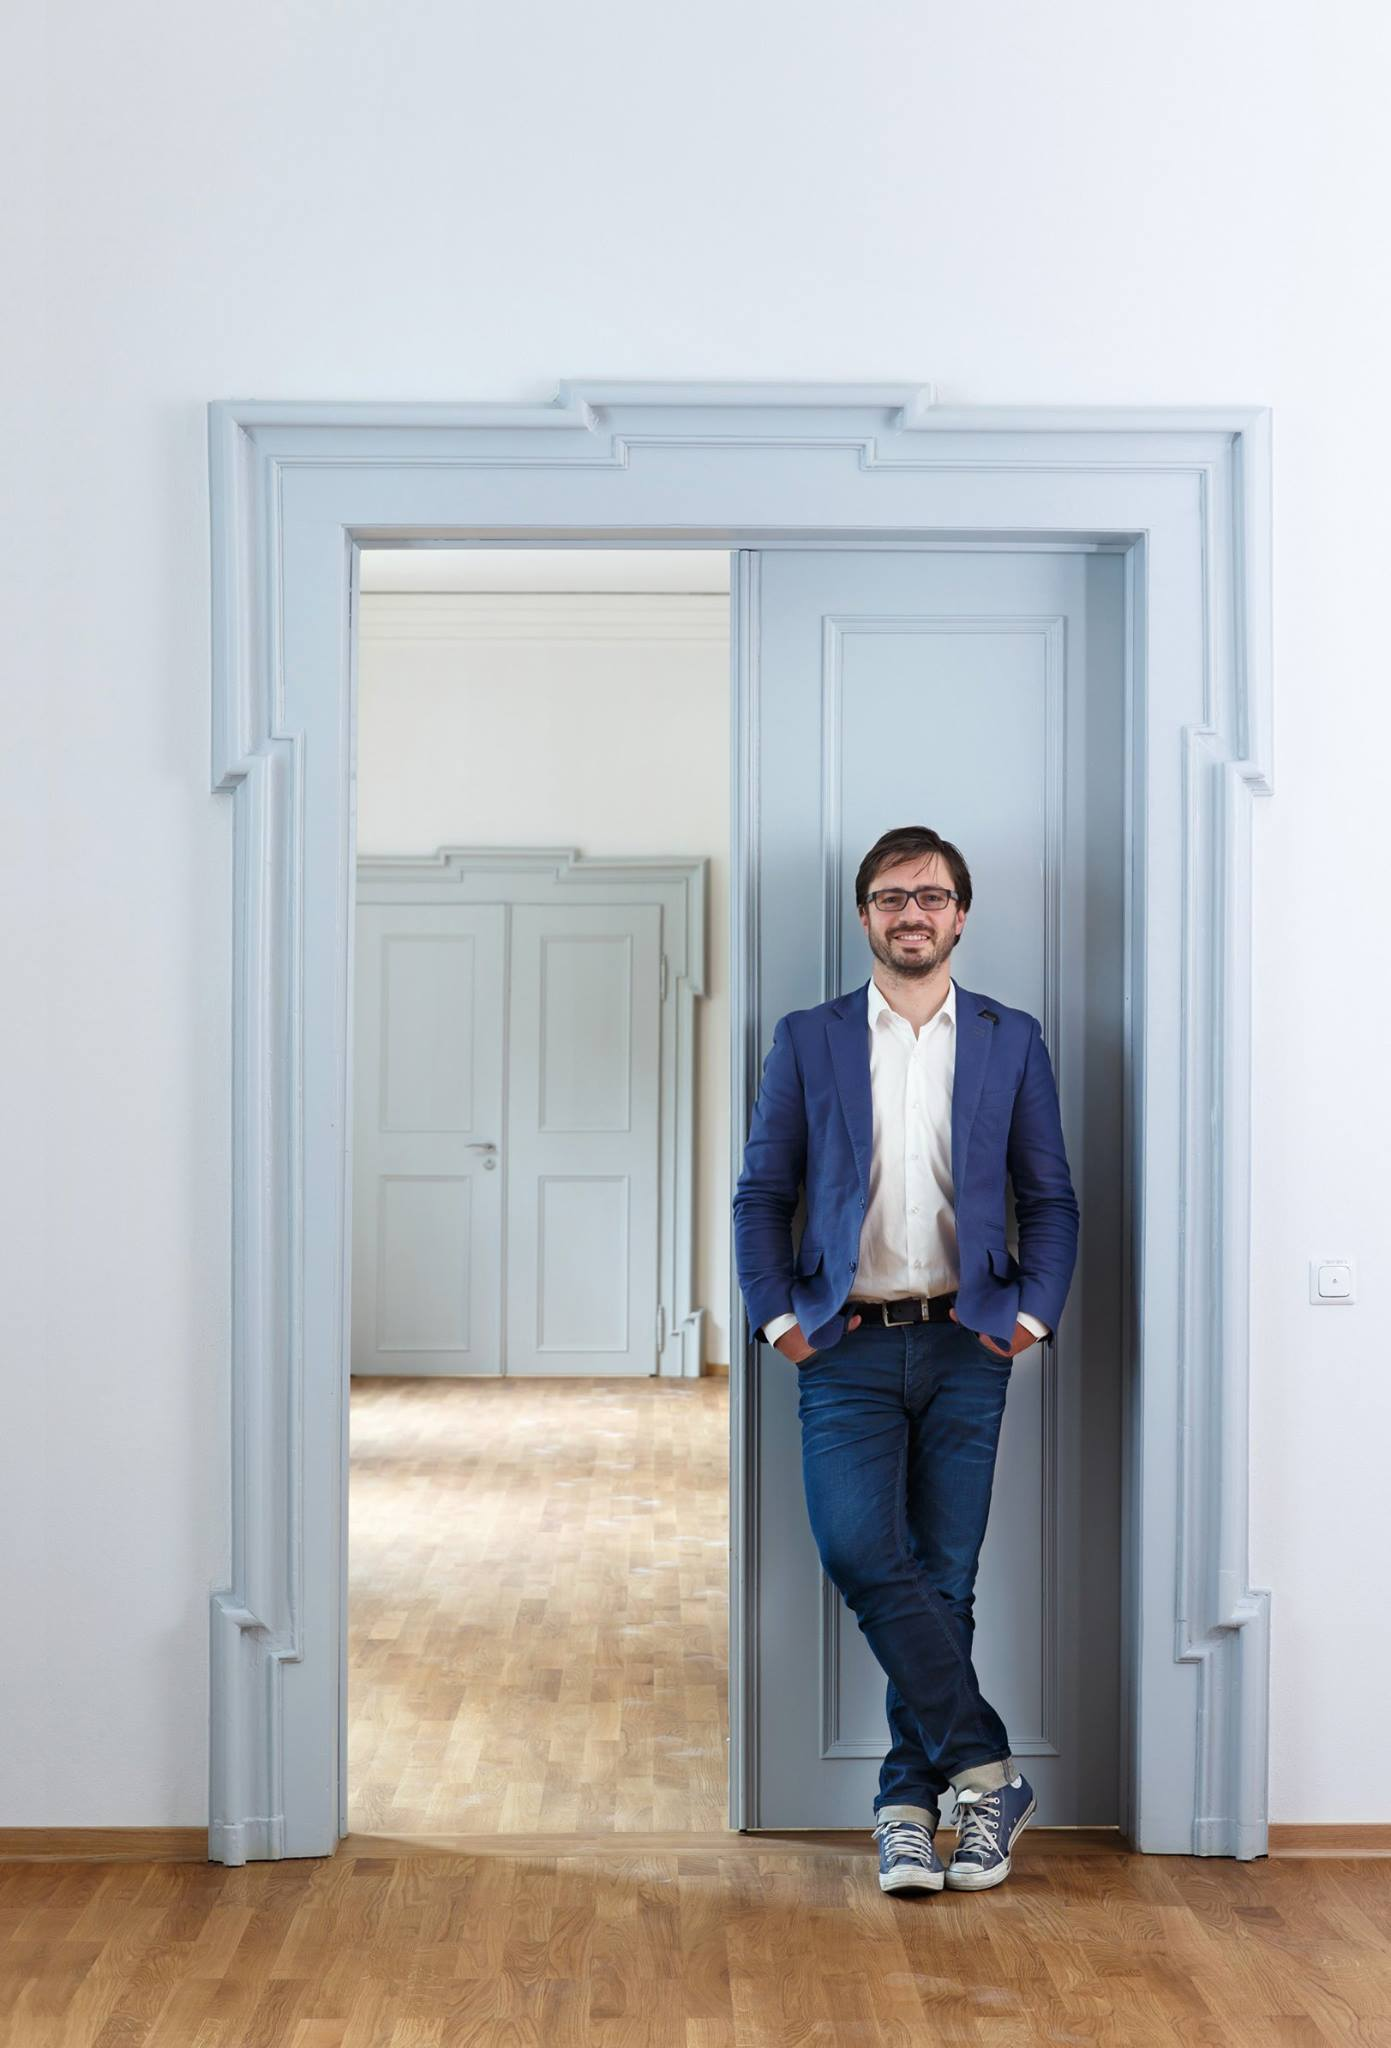 Christoph Aschenbrenner